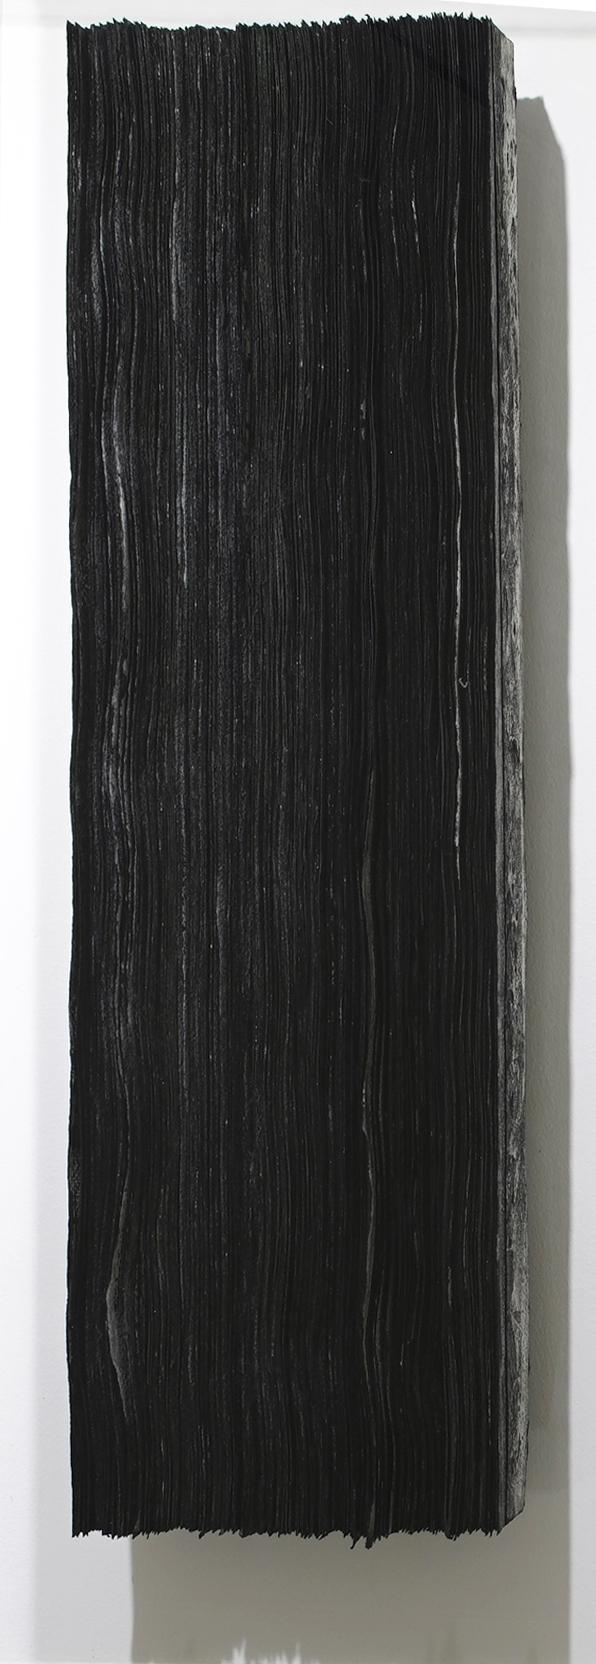 n. 328 - dispersion  2015 Acid-free cotton pulp watercolour paper, black pigment,  Yakirokusho  (burnt malachite mineral pigment), archival EVA glue and  nikawa  (cow hide glue) H78 x W18 x D12 cm (artwork)